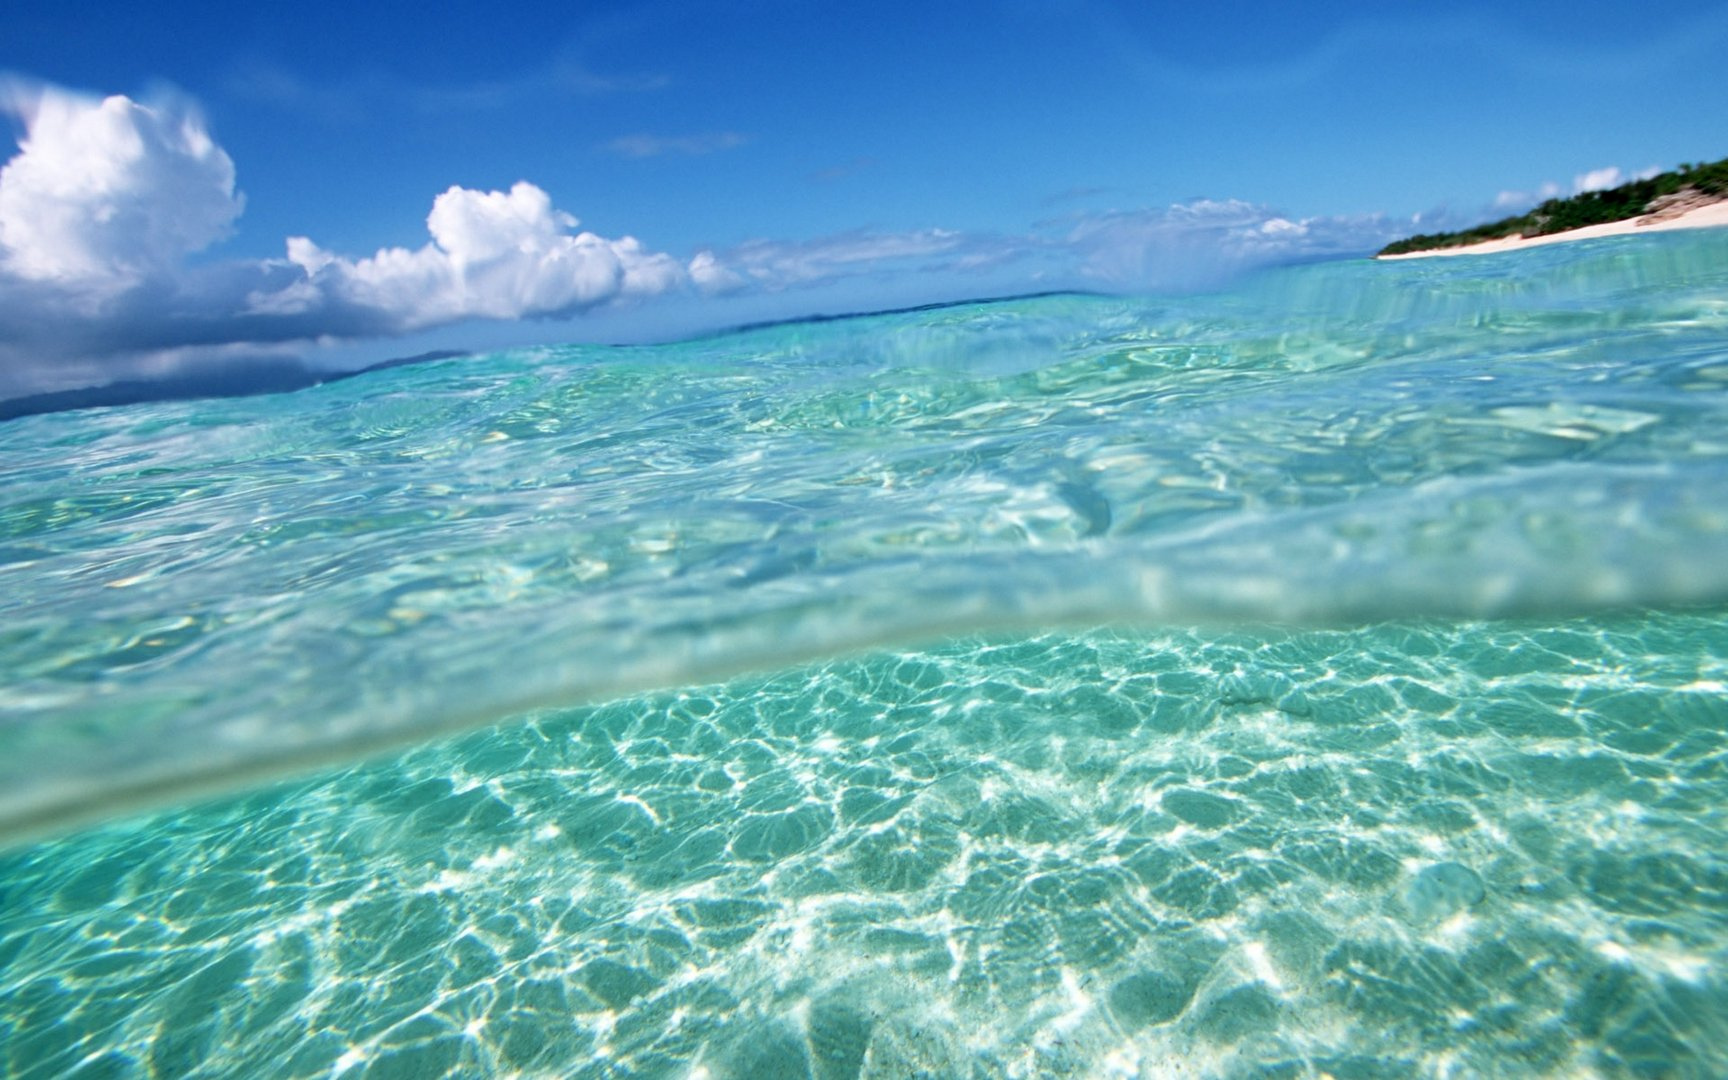 Download Sea Wallpaper wallpaper Clear Sea Water 1728x1080